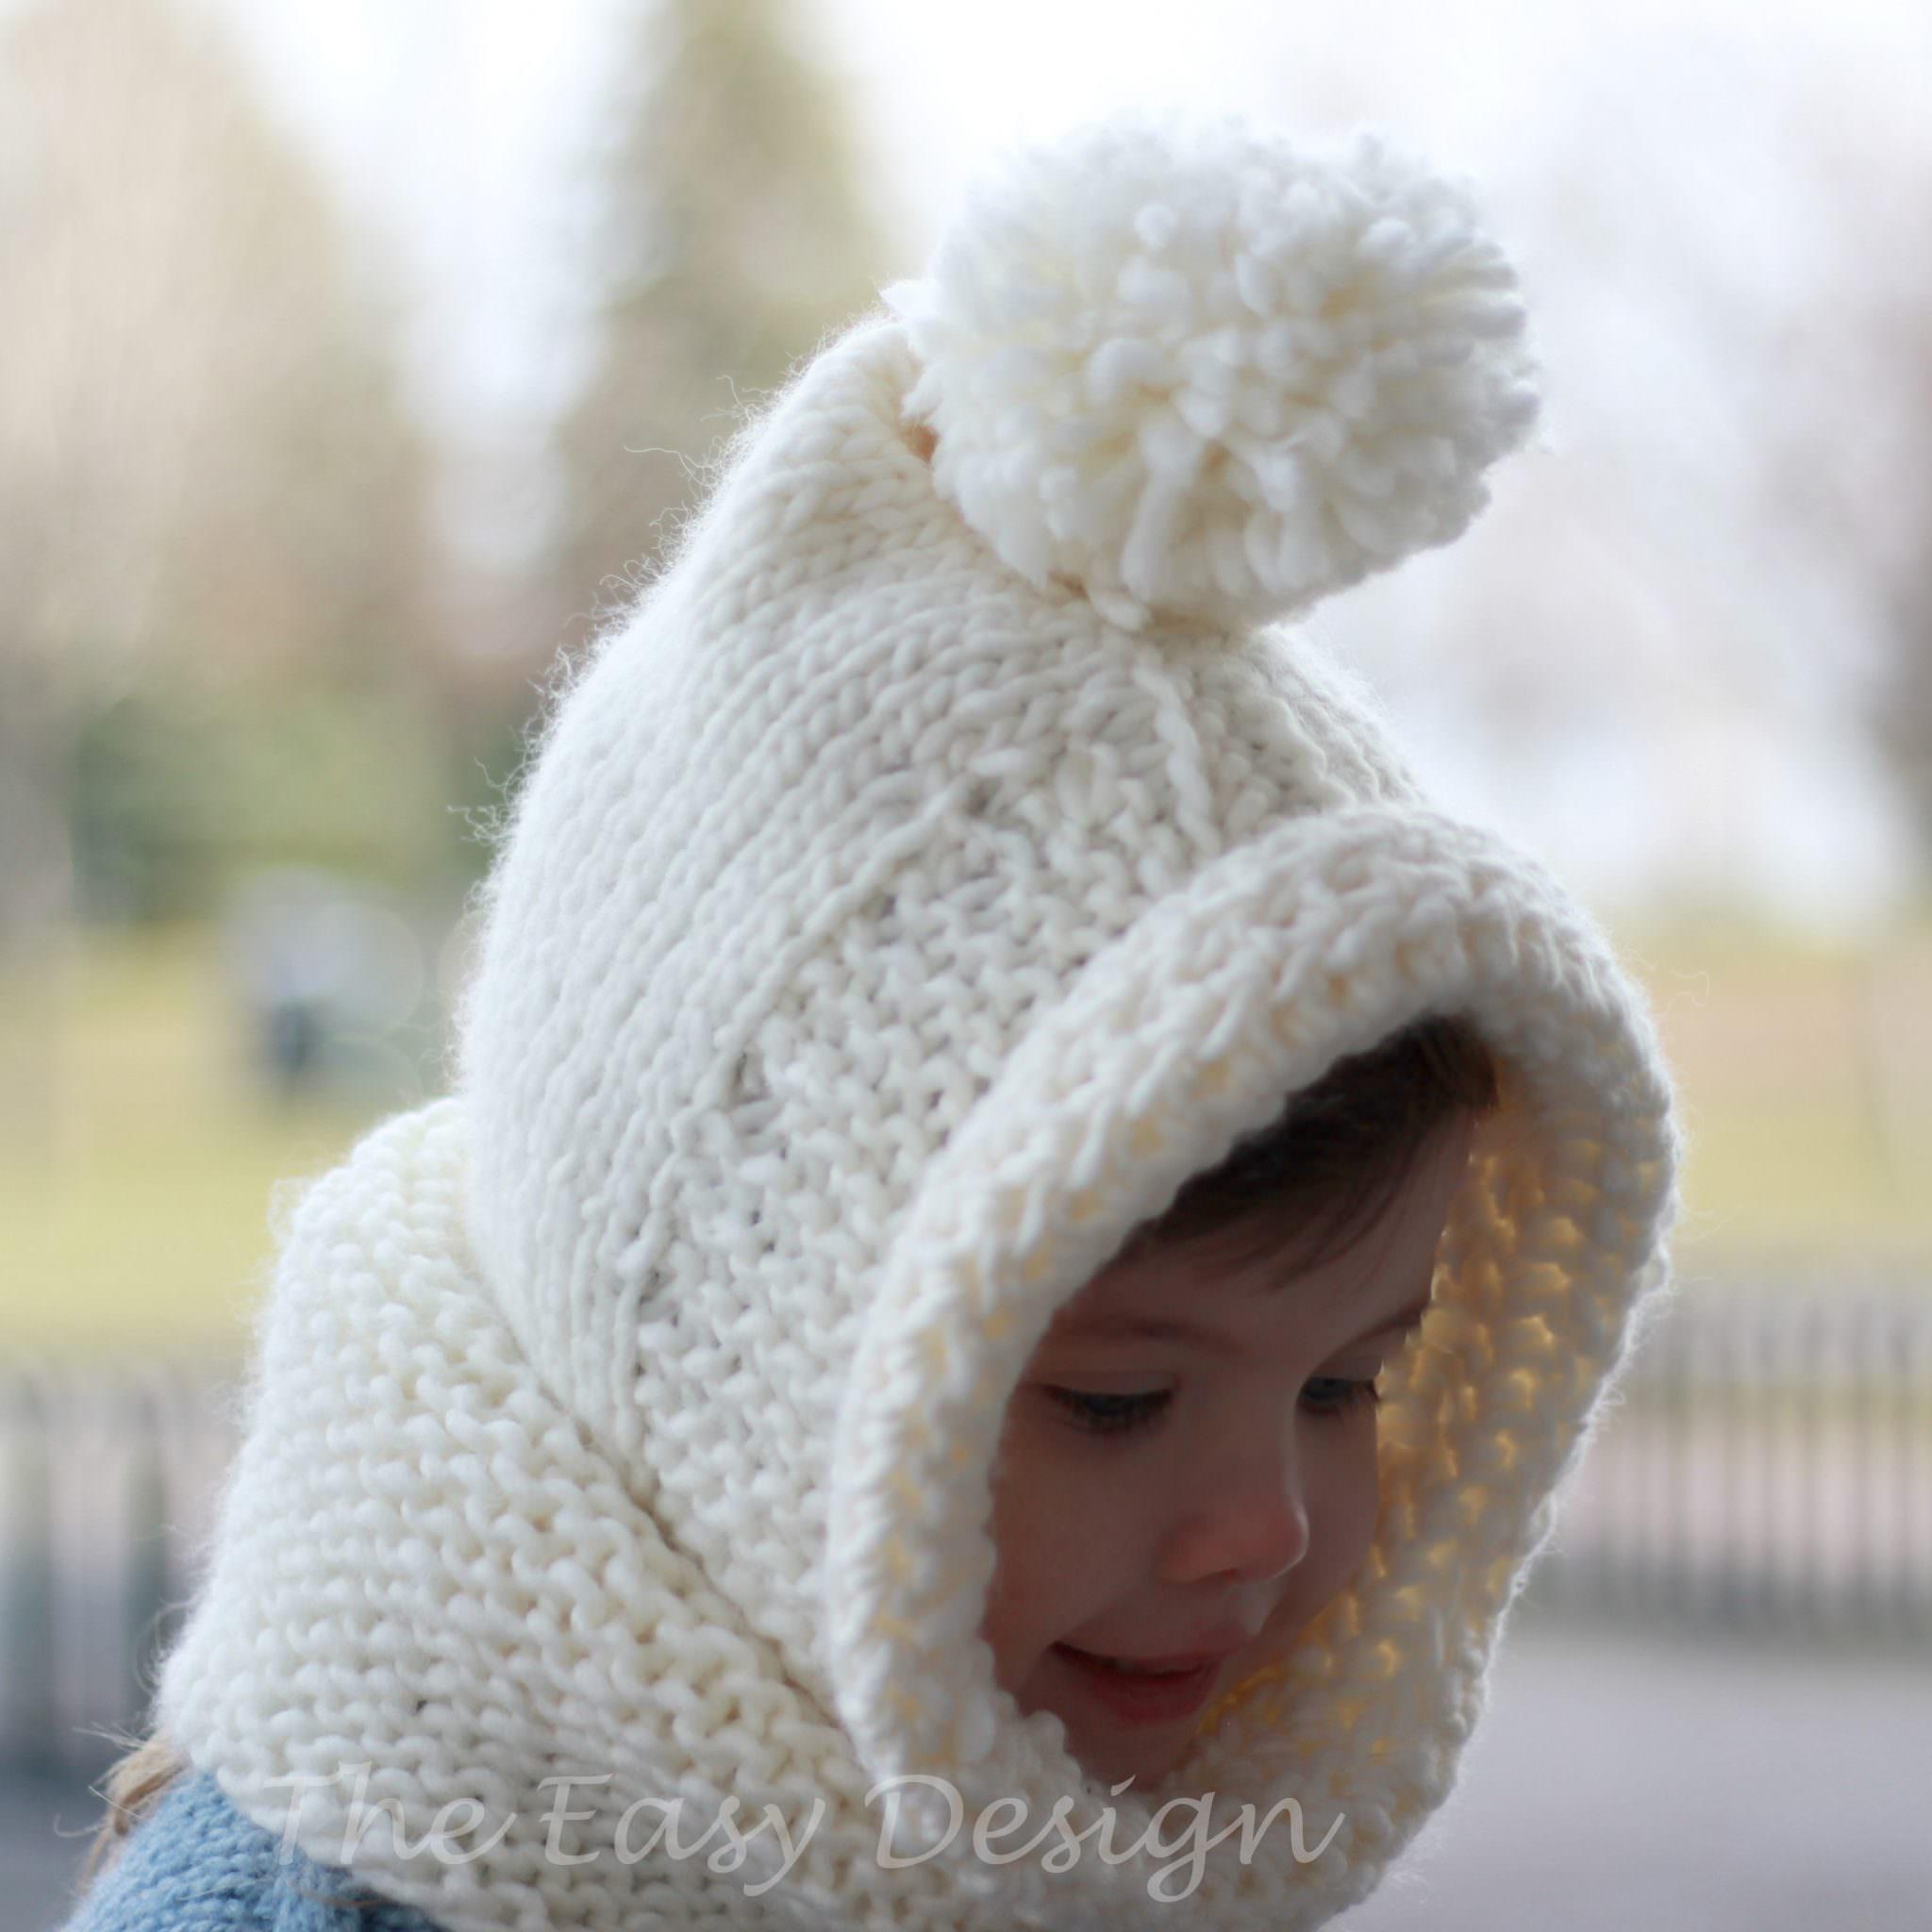 Bambi Hooded Cowl - Knitting pattern - The Easy Design